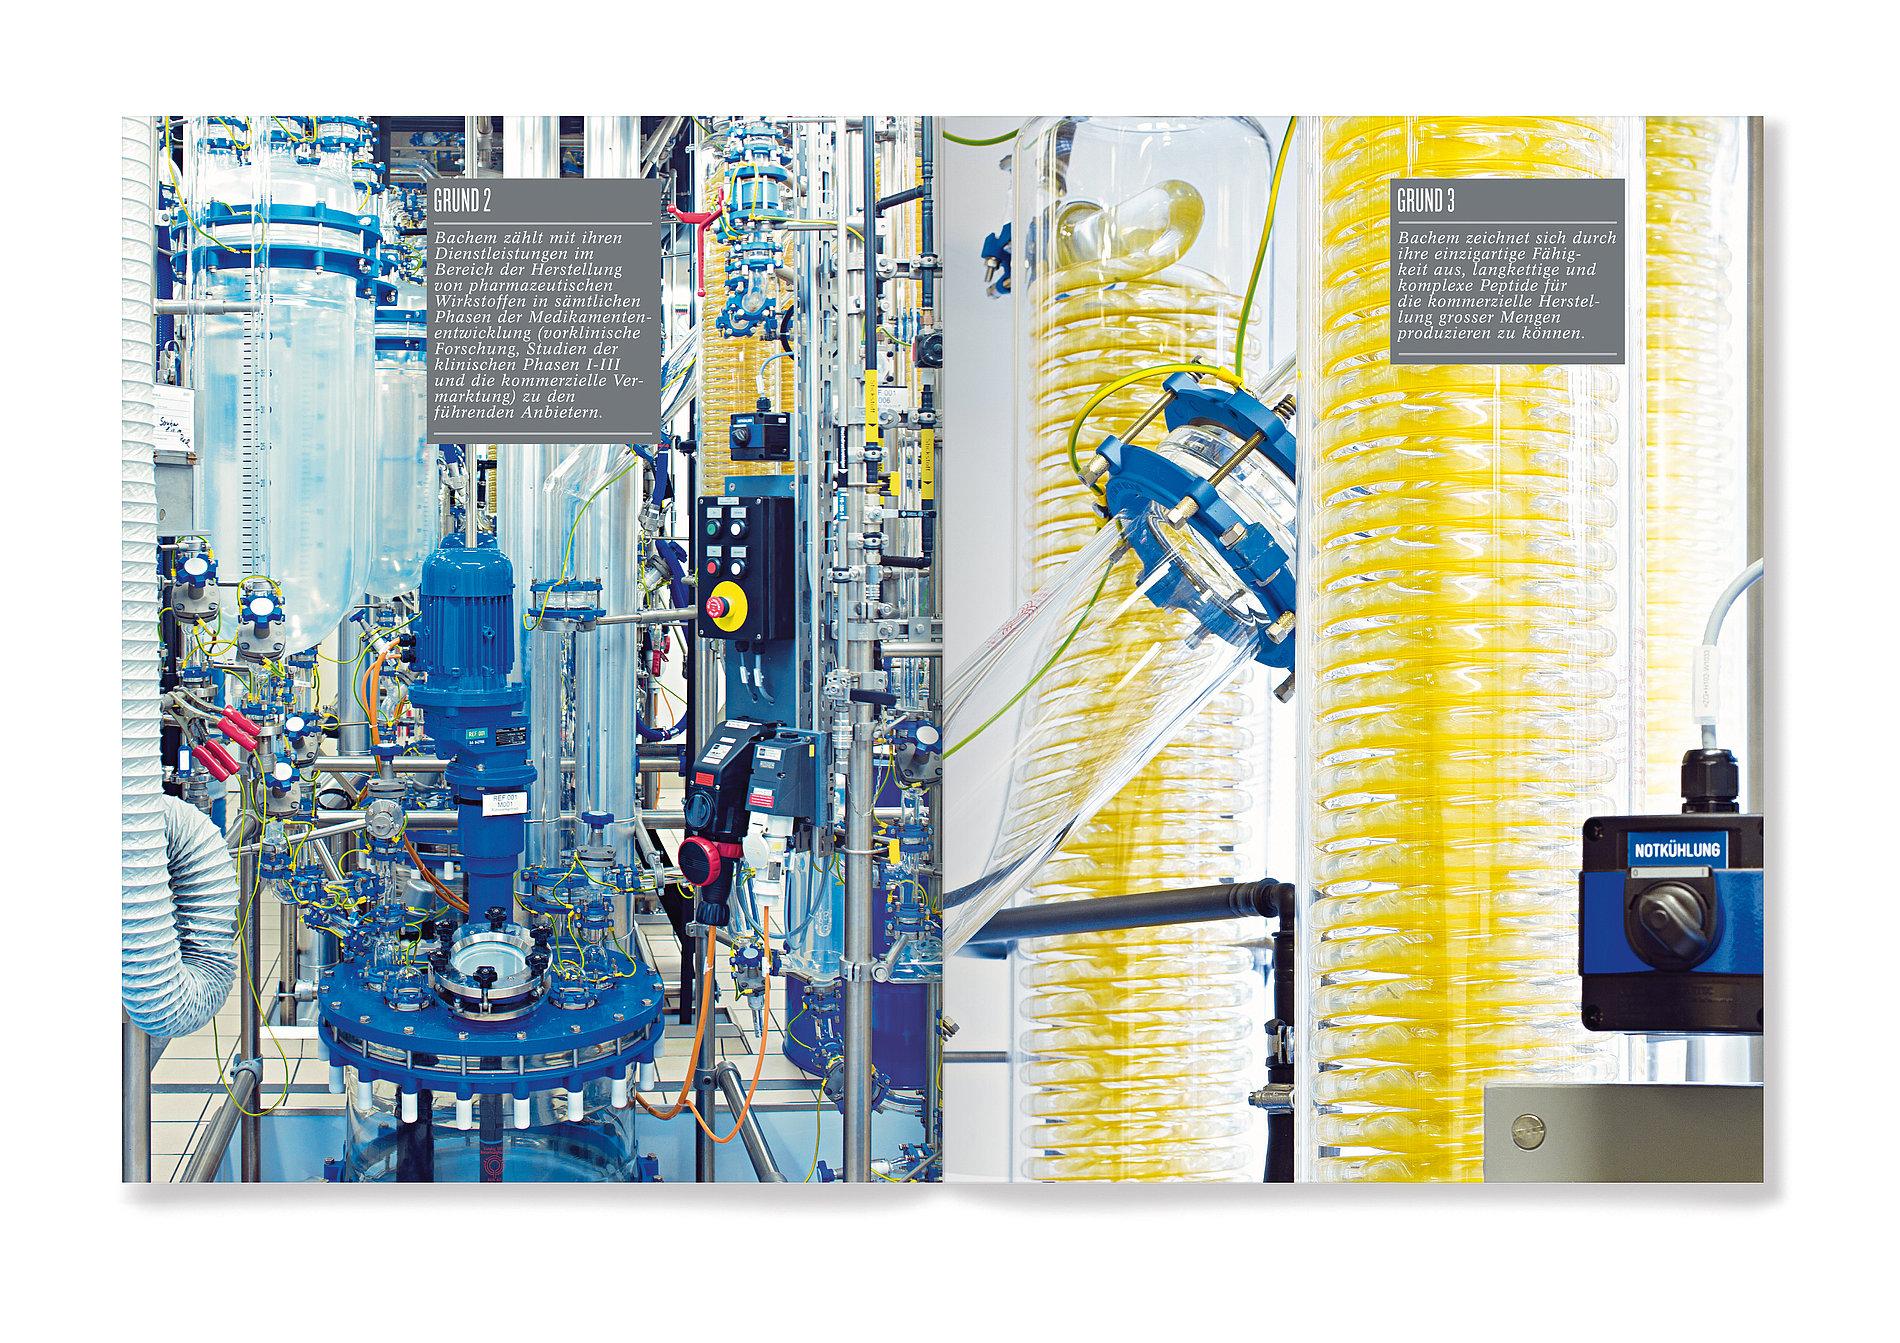 Bachem  Annual Report 2011 | Red Dot Design Award